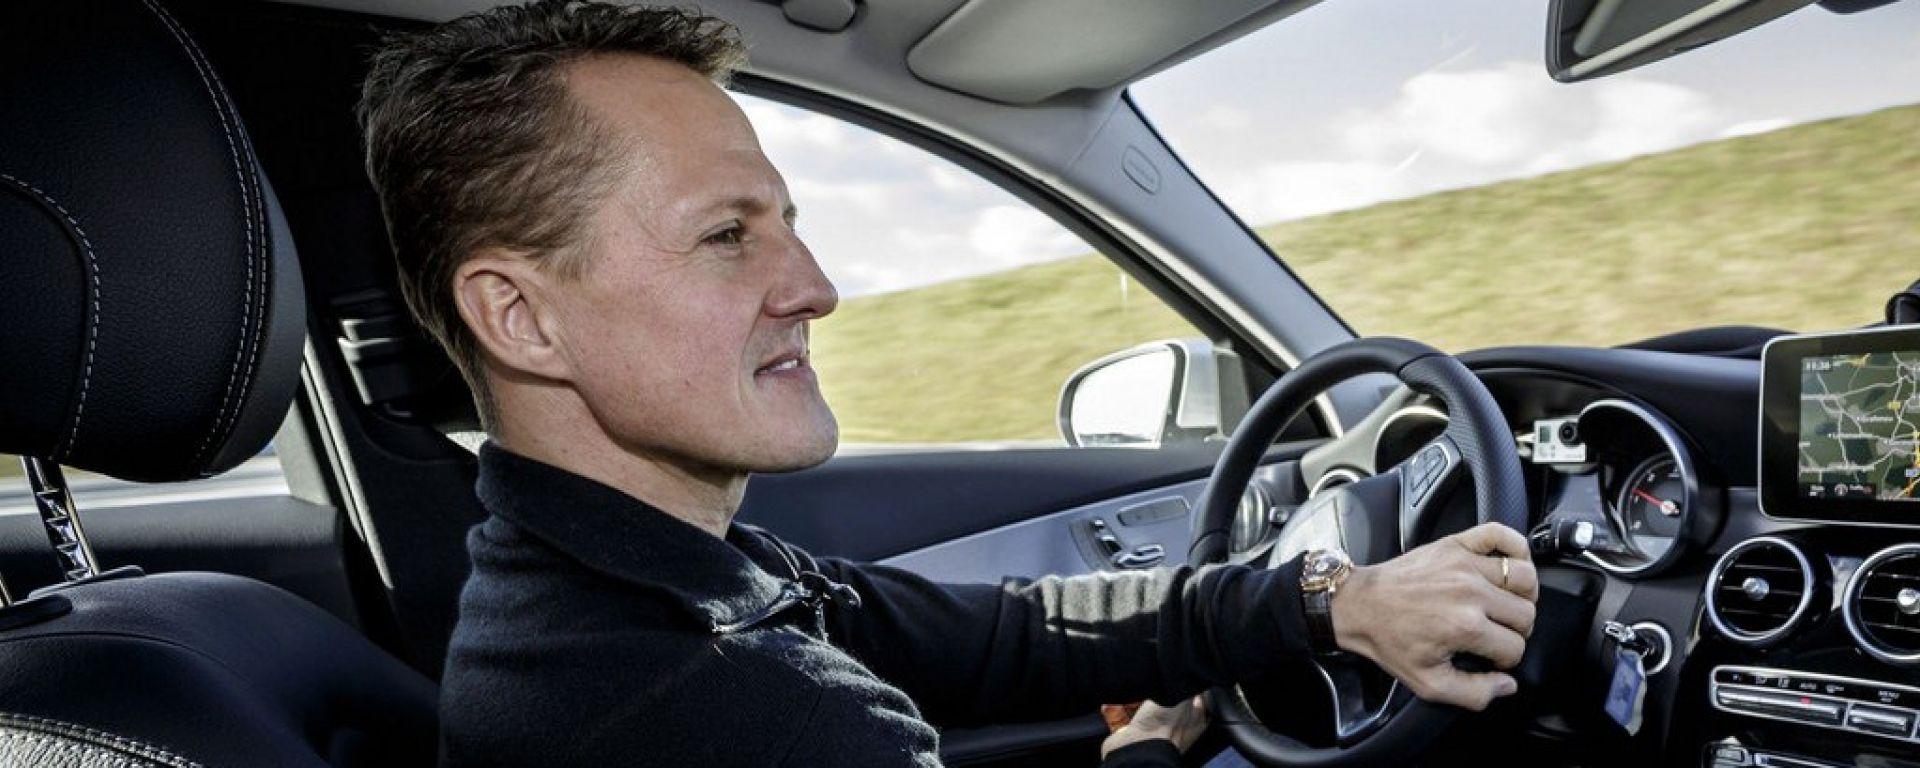 Mercedes Classe C 2014: la prova Schumacher